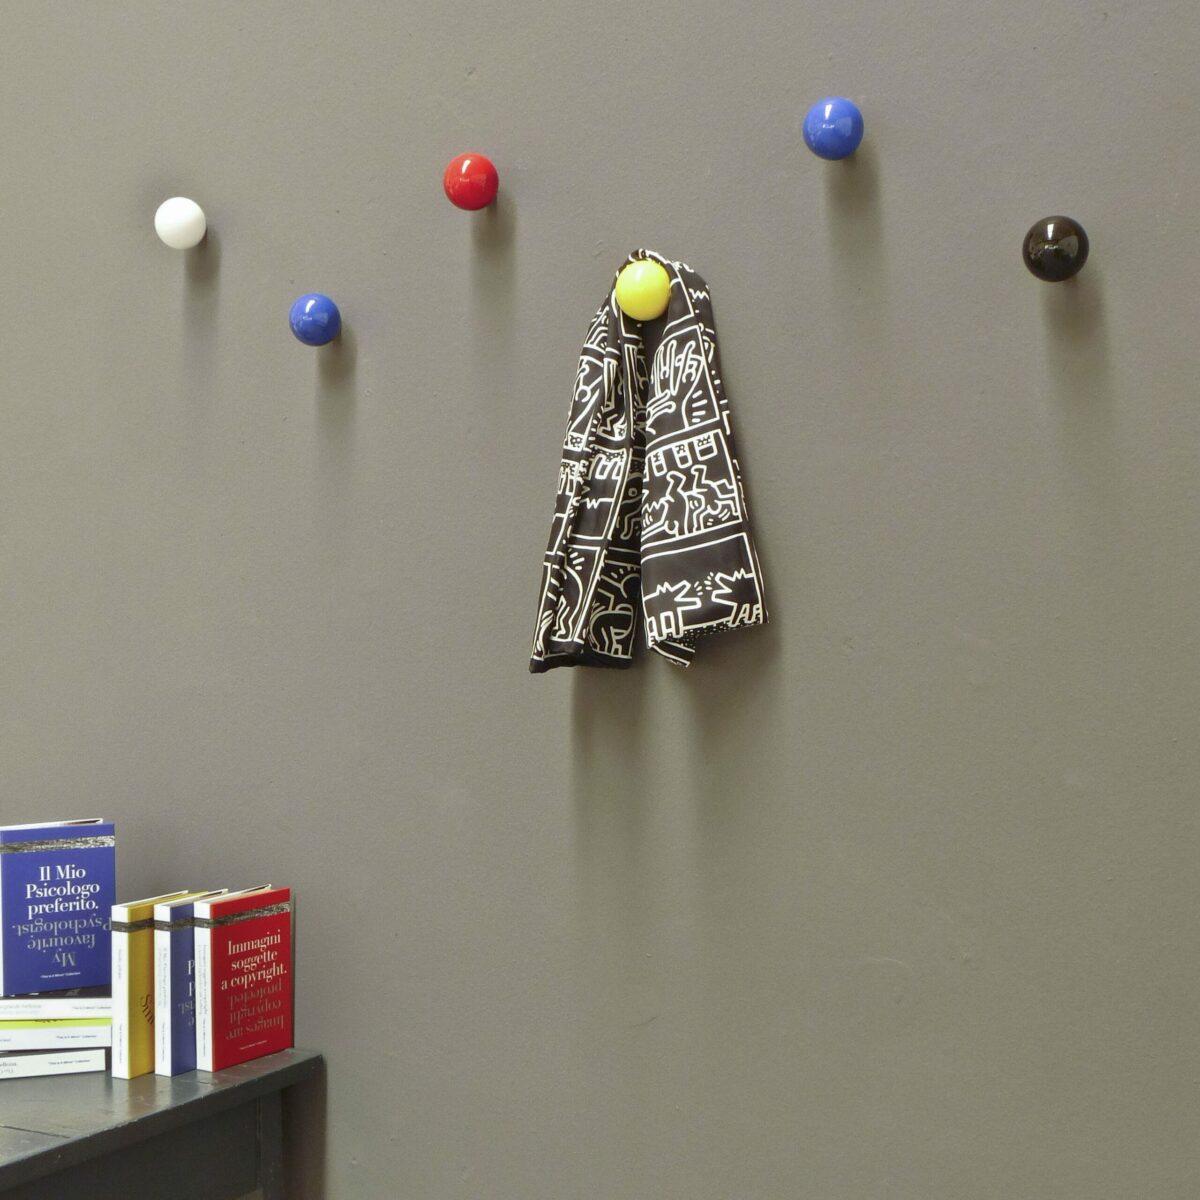 palline appendiabiti colorate su parete grigia